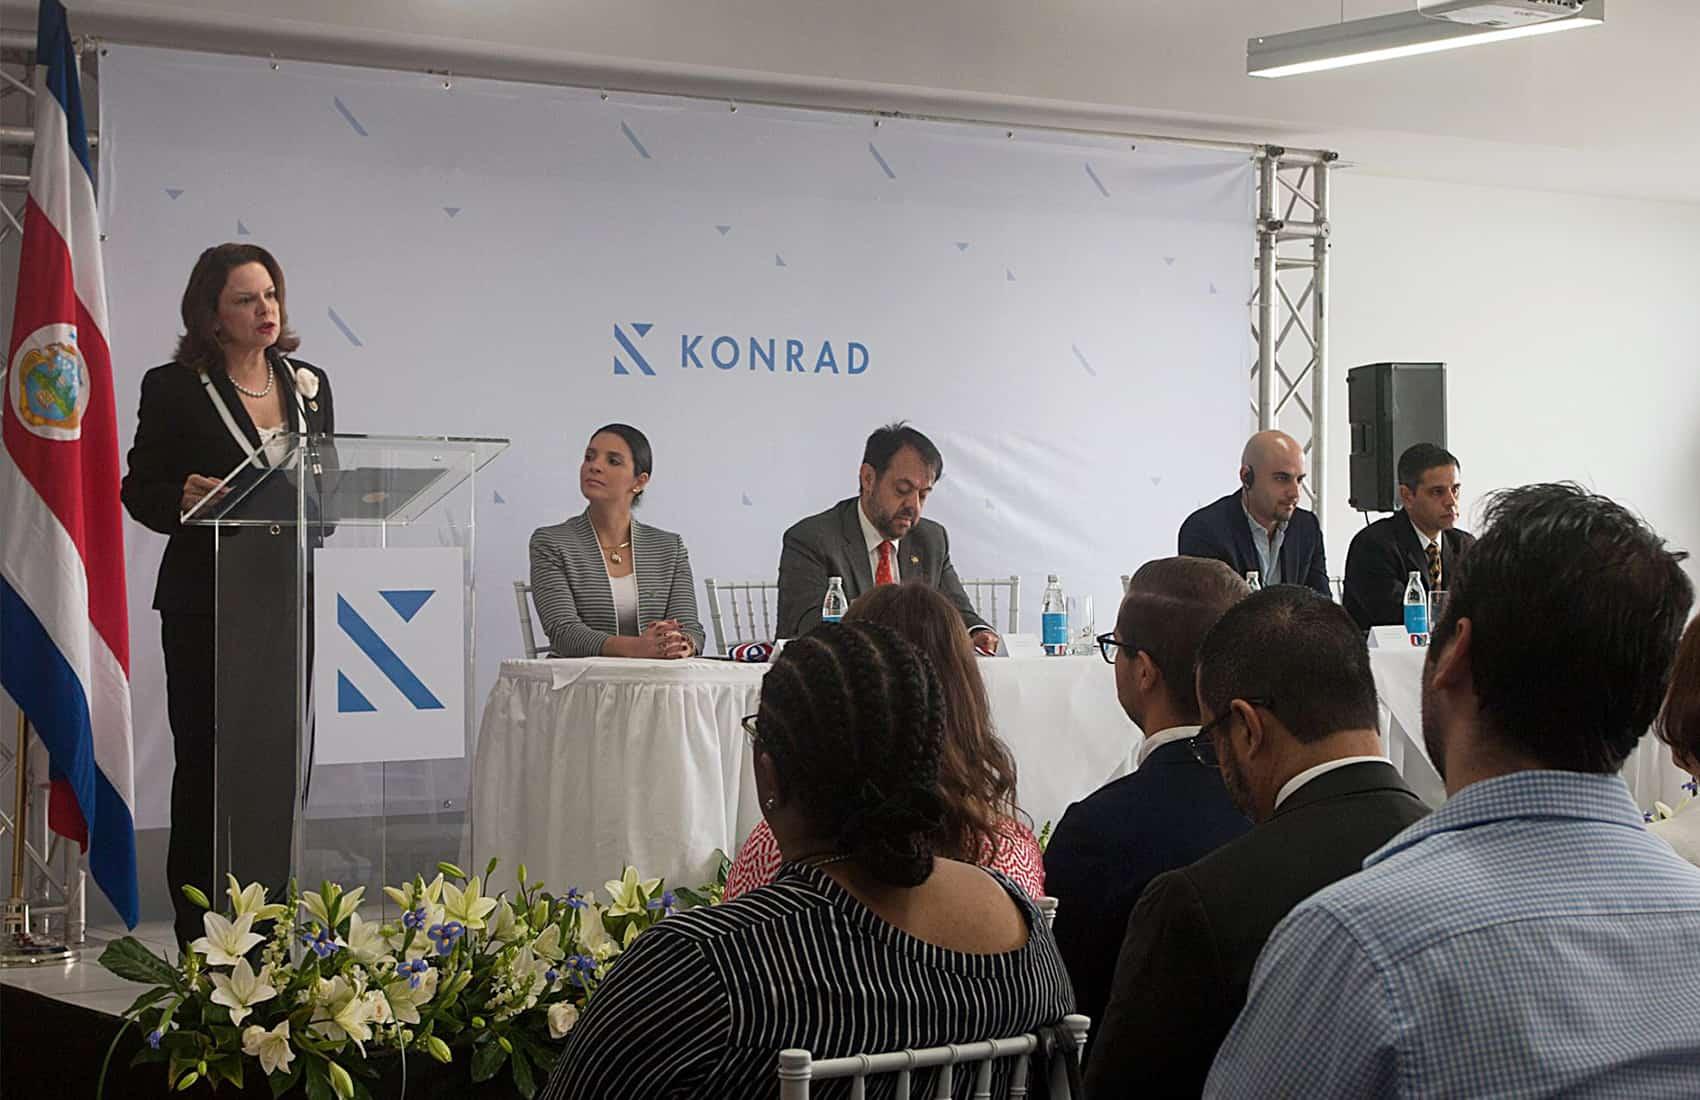 Konrad Group opening in Costa Rica. Aug. 22, 2016.